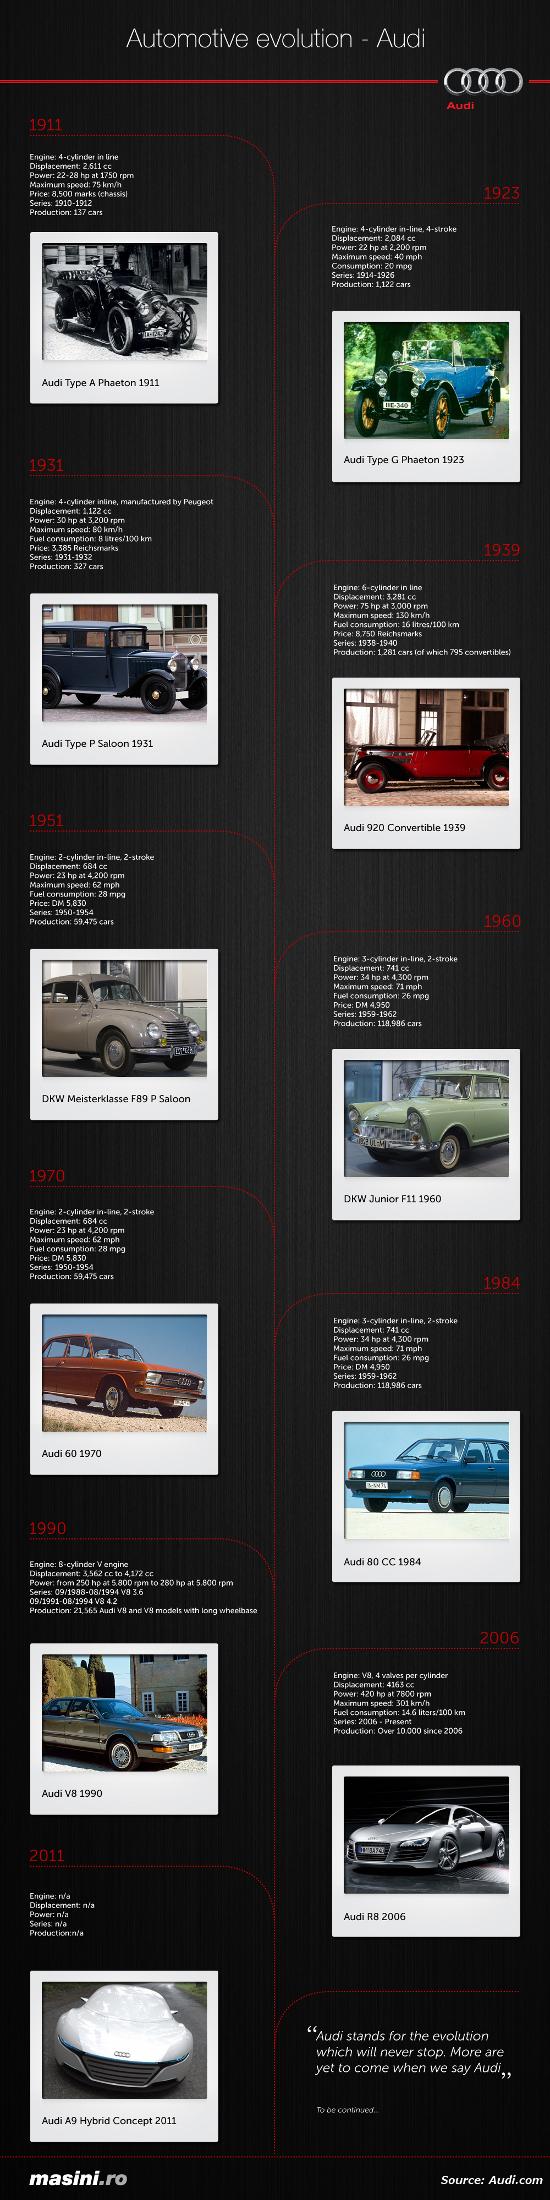 Audi Evolution %u2013 Infografic Masini.ro